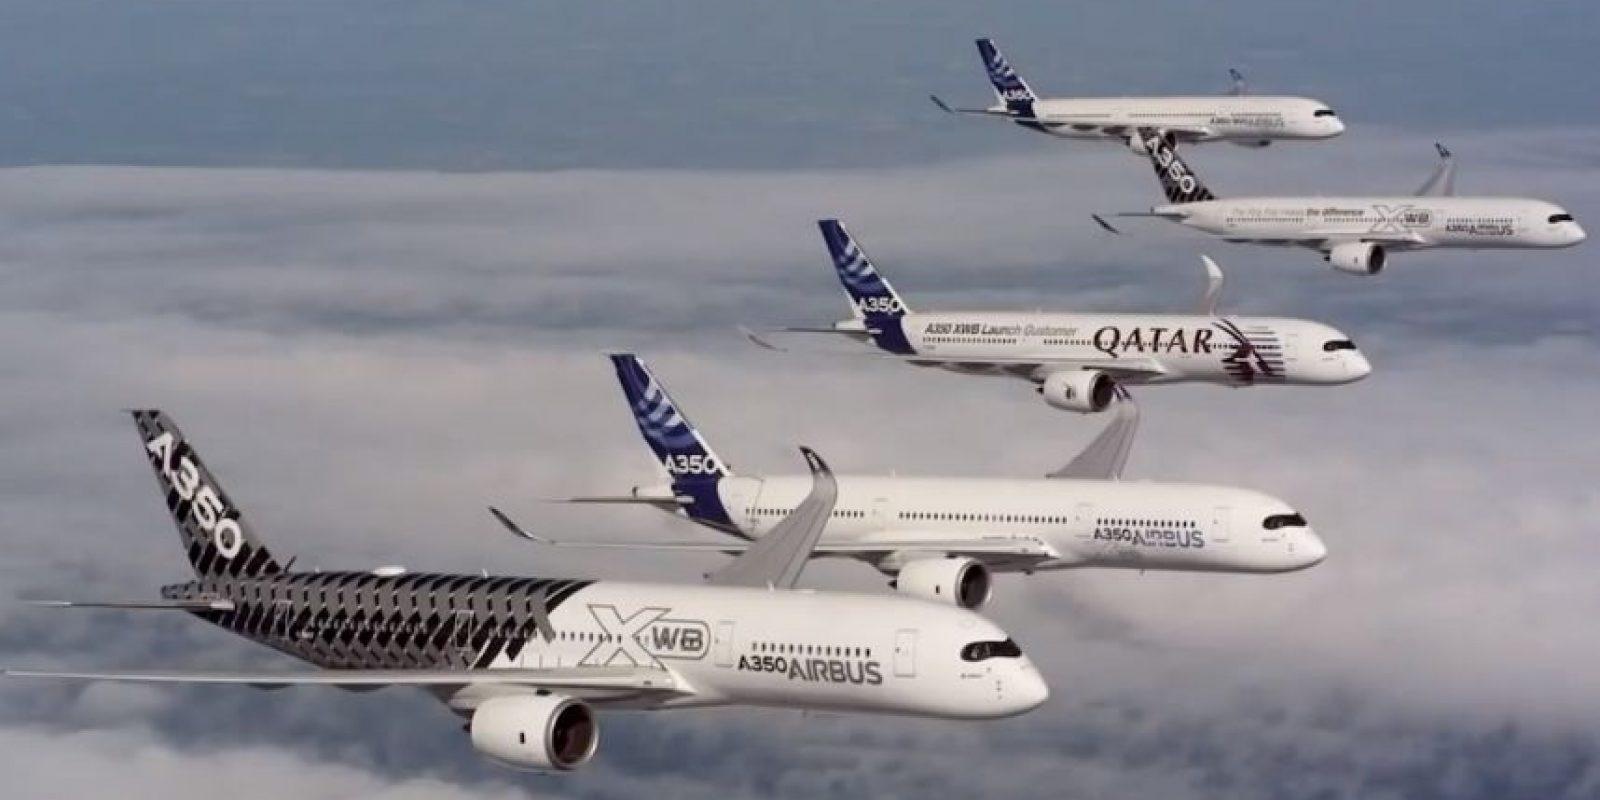 Foto:Youtube: Airbus